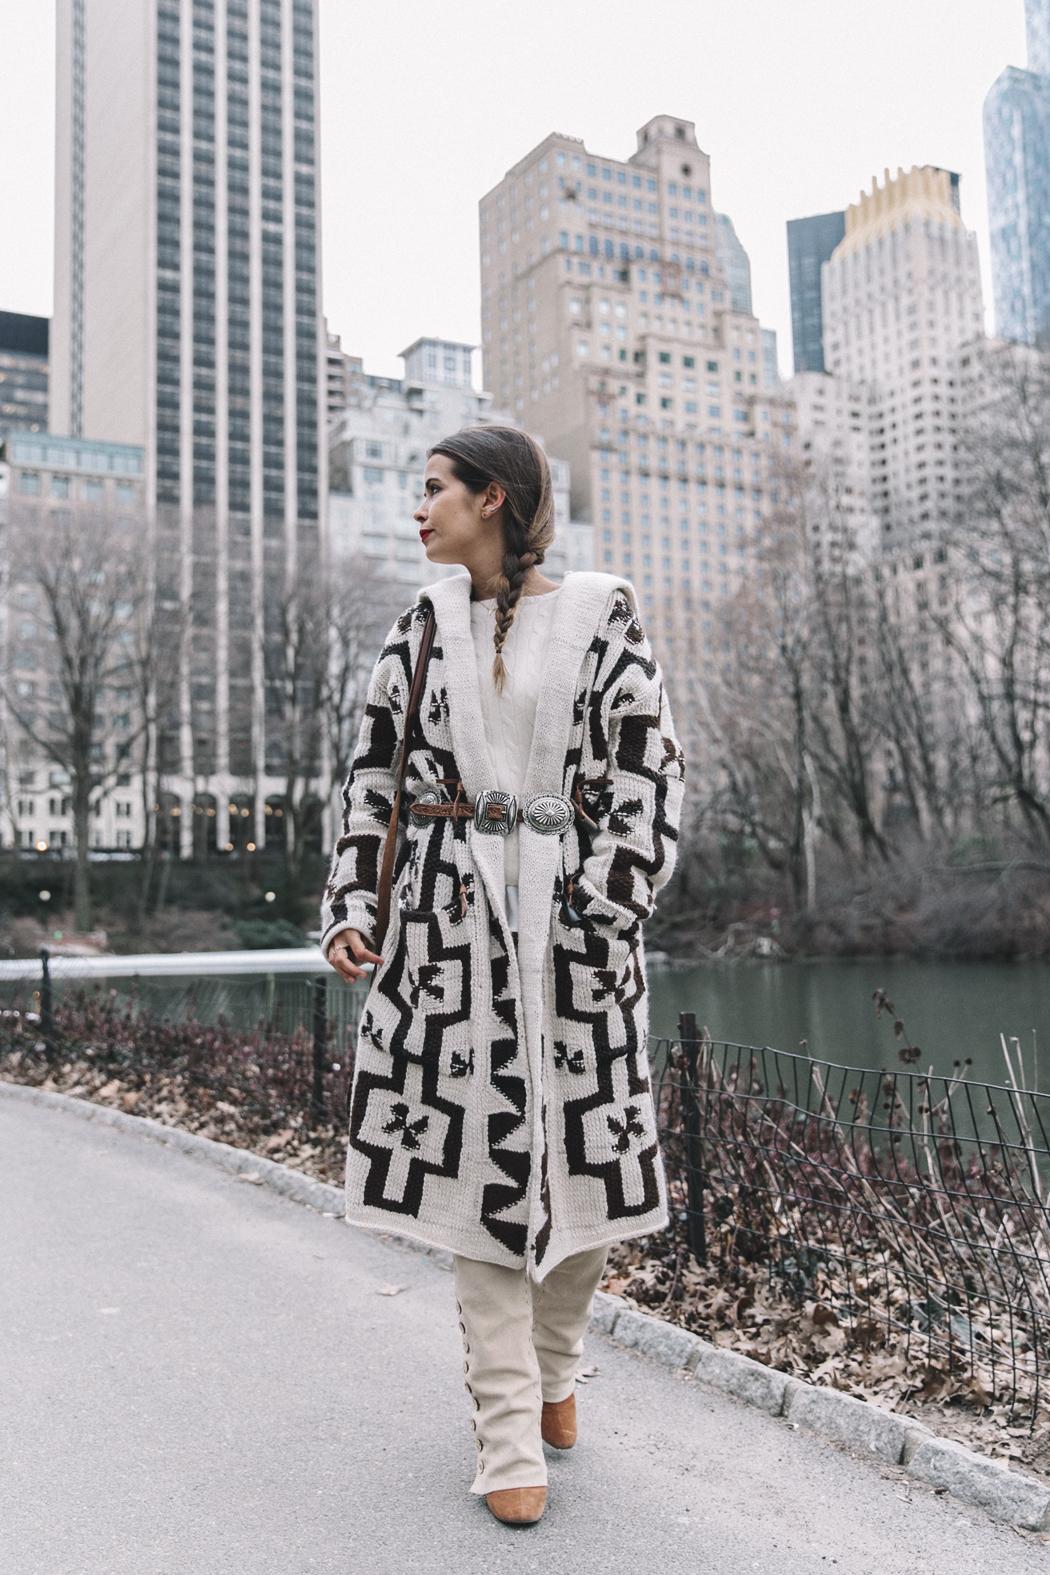 Polo_Ralph_Lauren_Collage_Vintage-Street_Style-NYFW-New_York_Fashion_Week-Knit_Jacket-Cream_Trousers-Boho-Winter_White-27